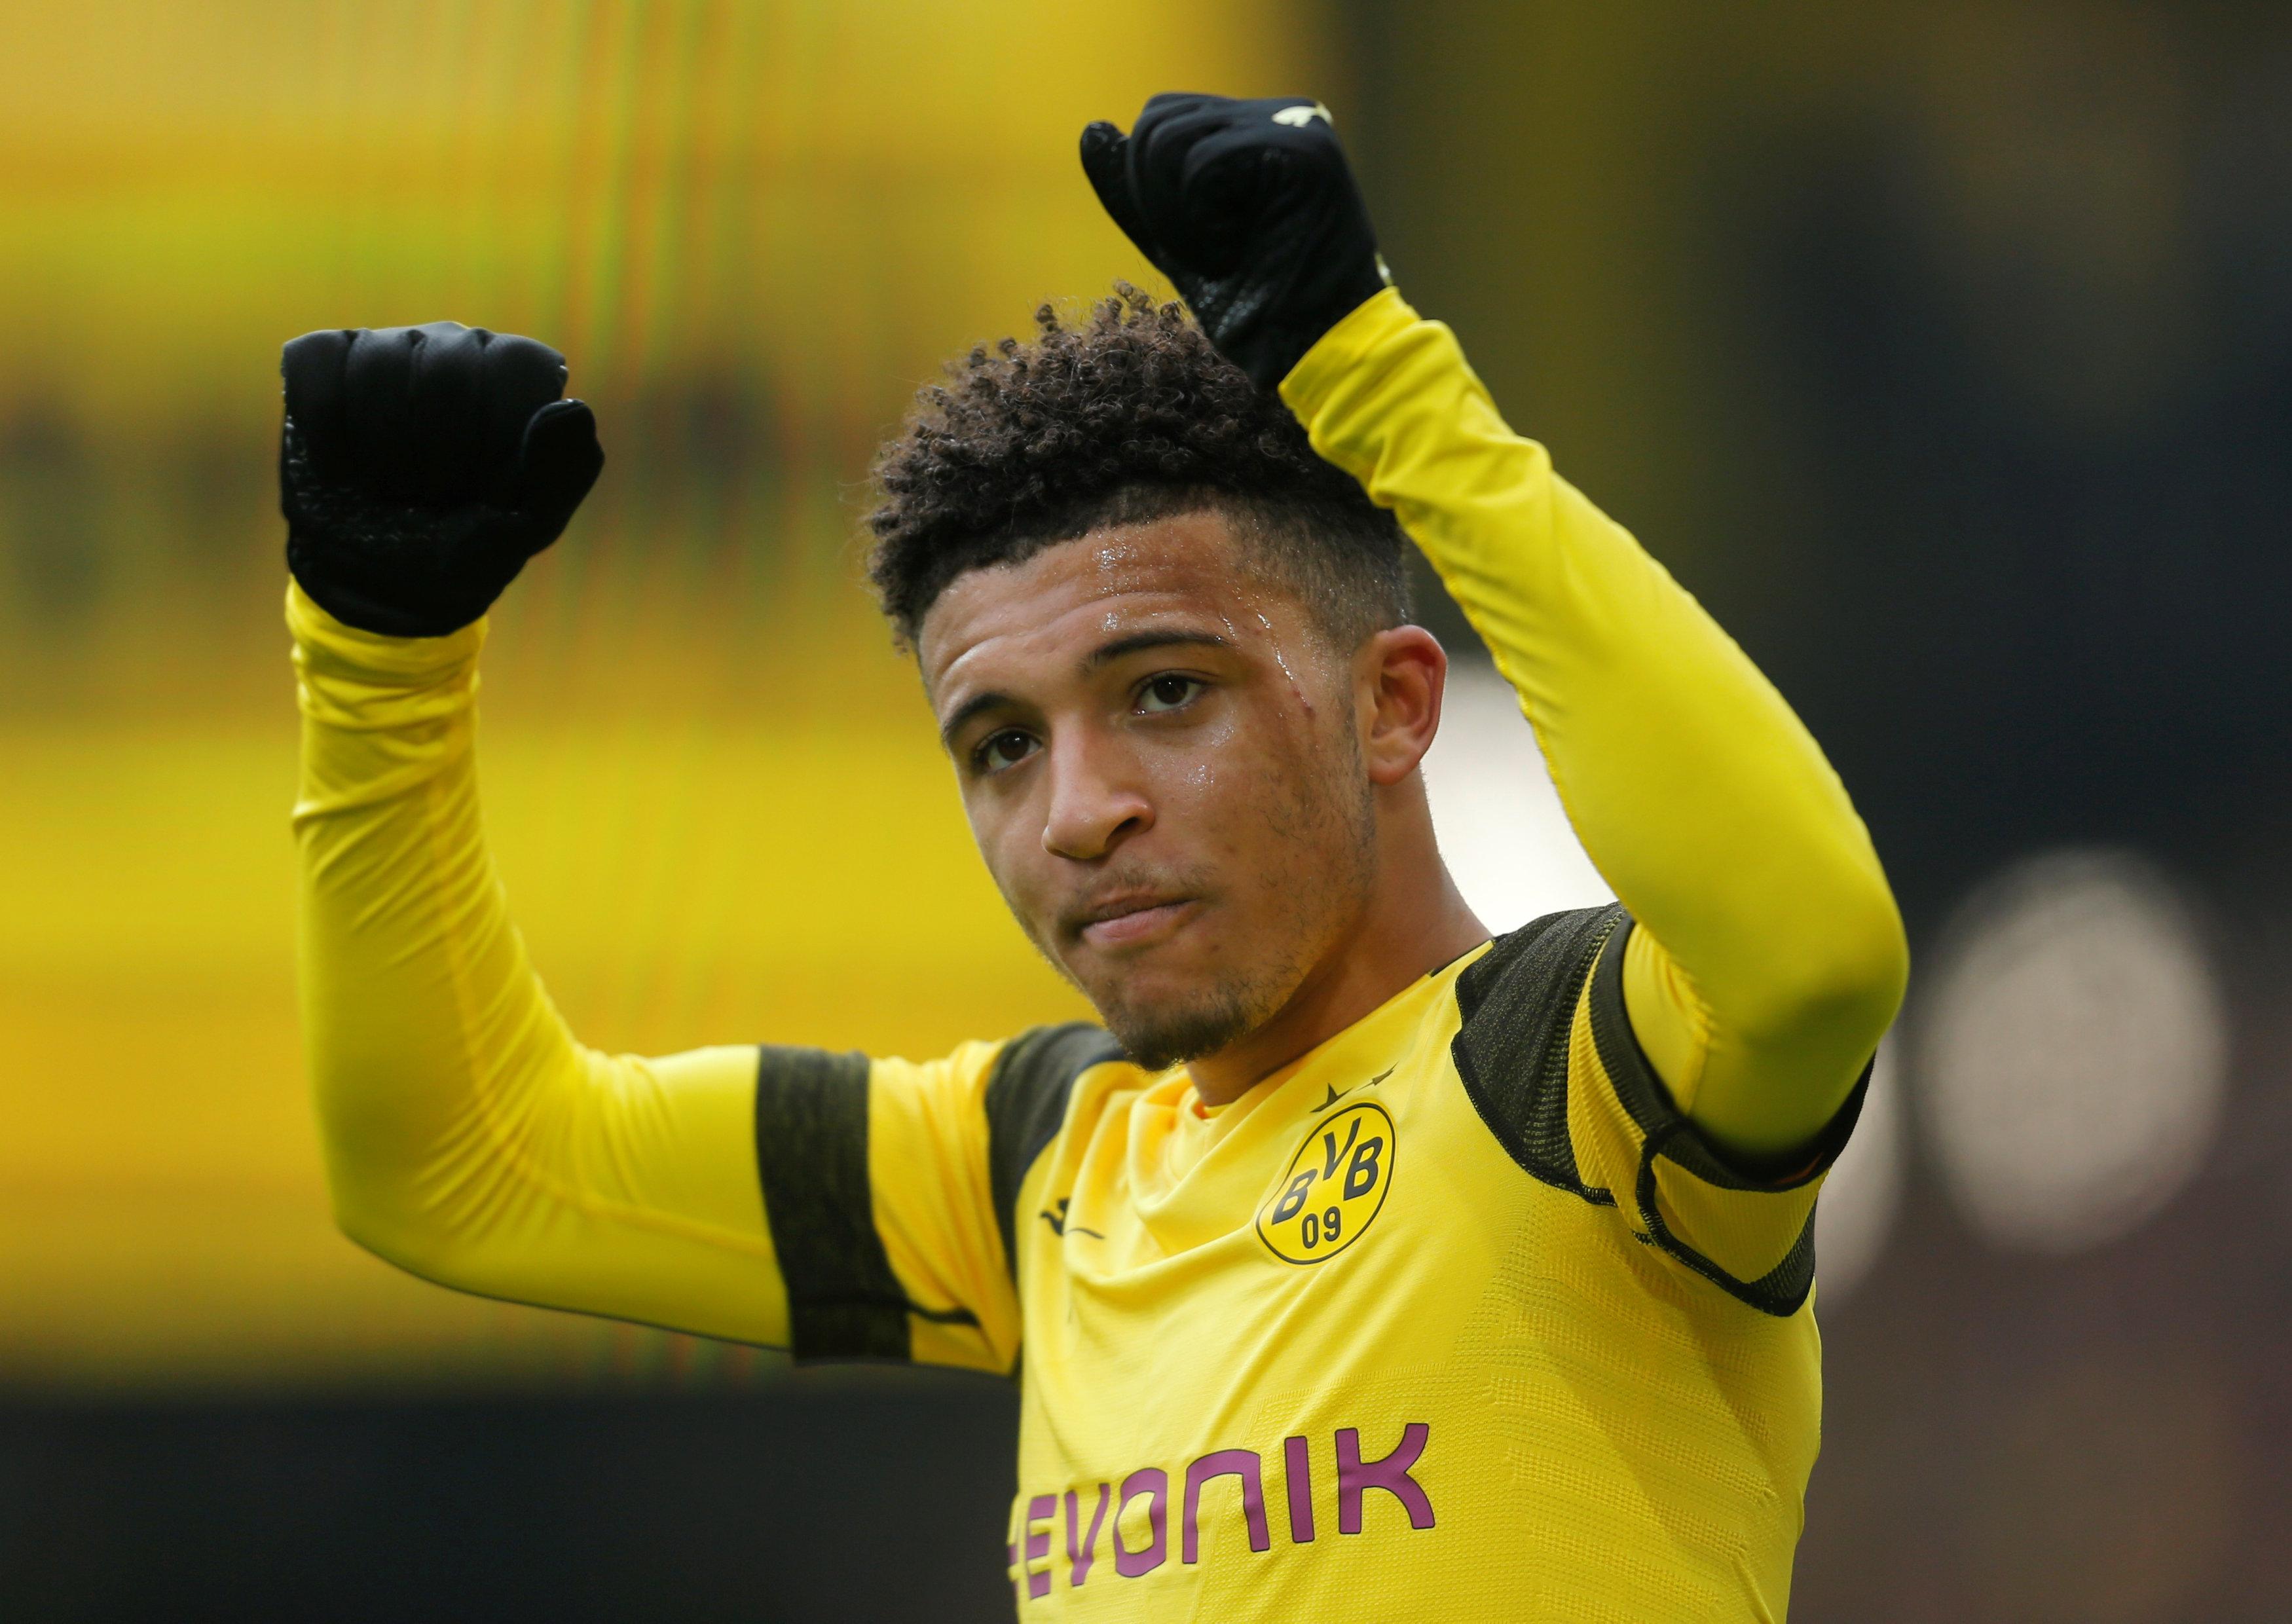 Jadon Sancho's agent spoke to Manchester United before summer, says Dortmund's Sporting Director